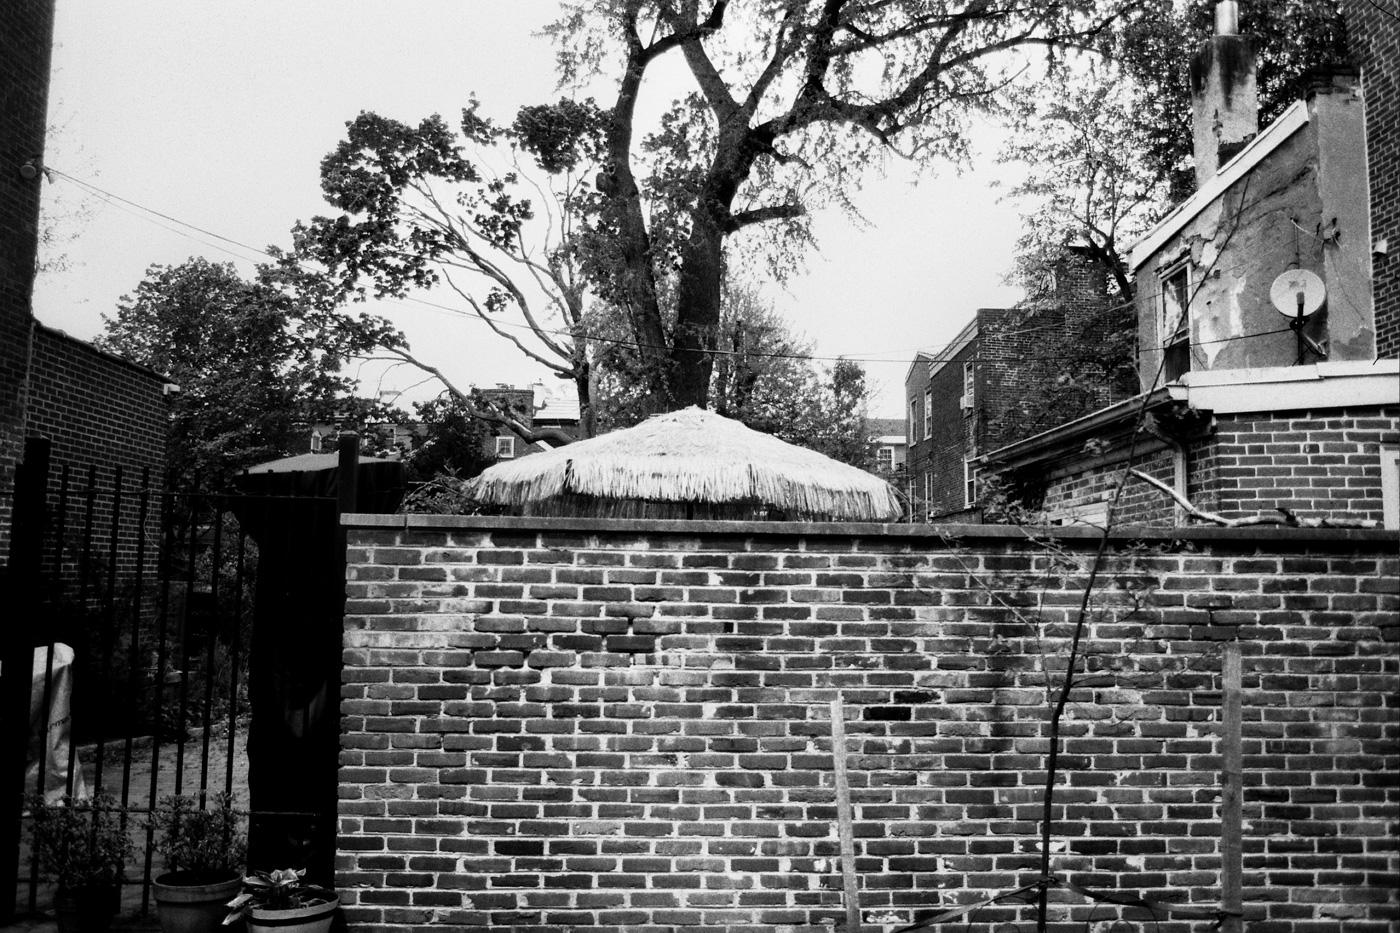 Brick Wall and Umbrella